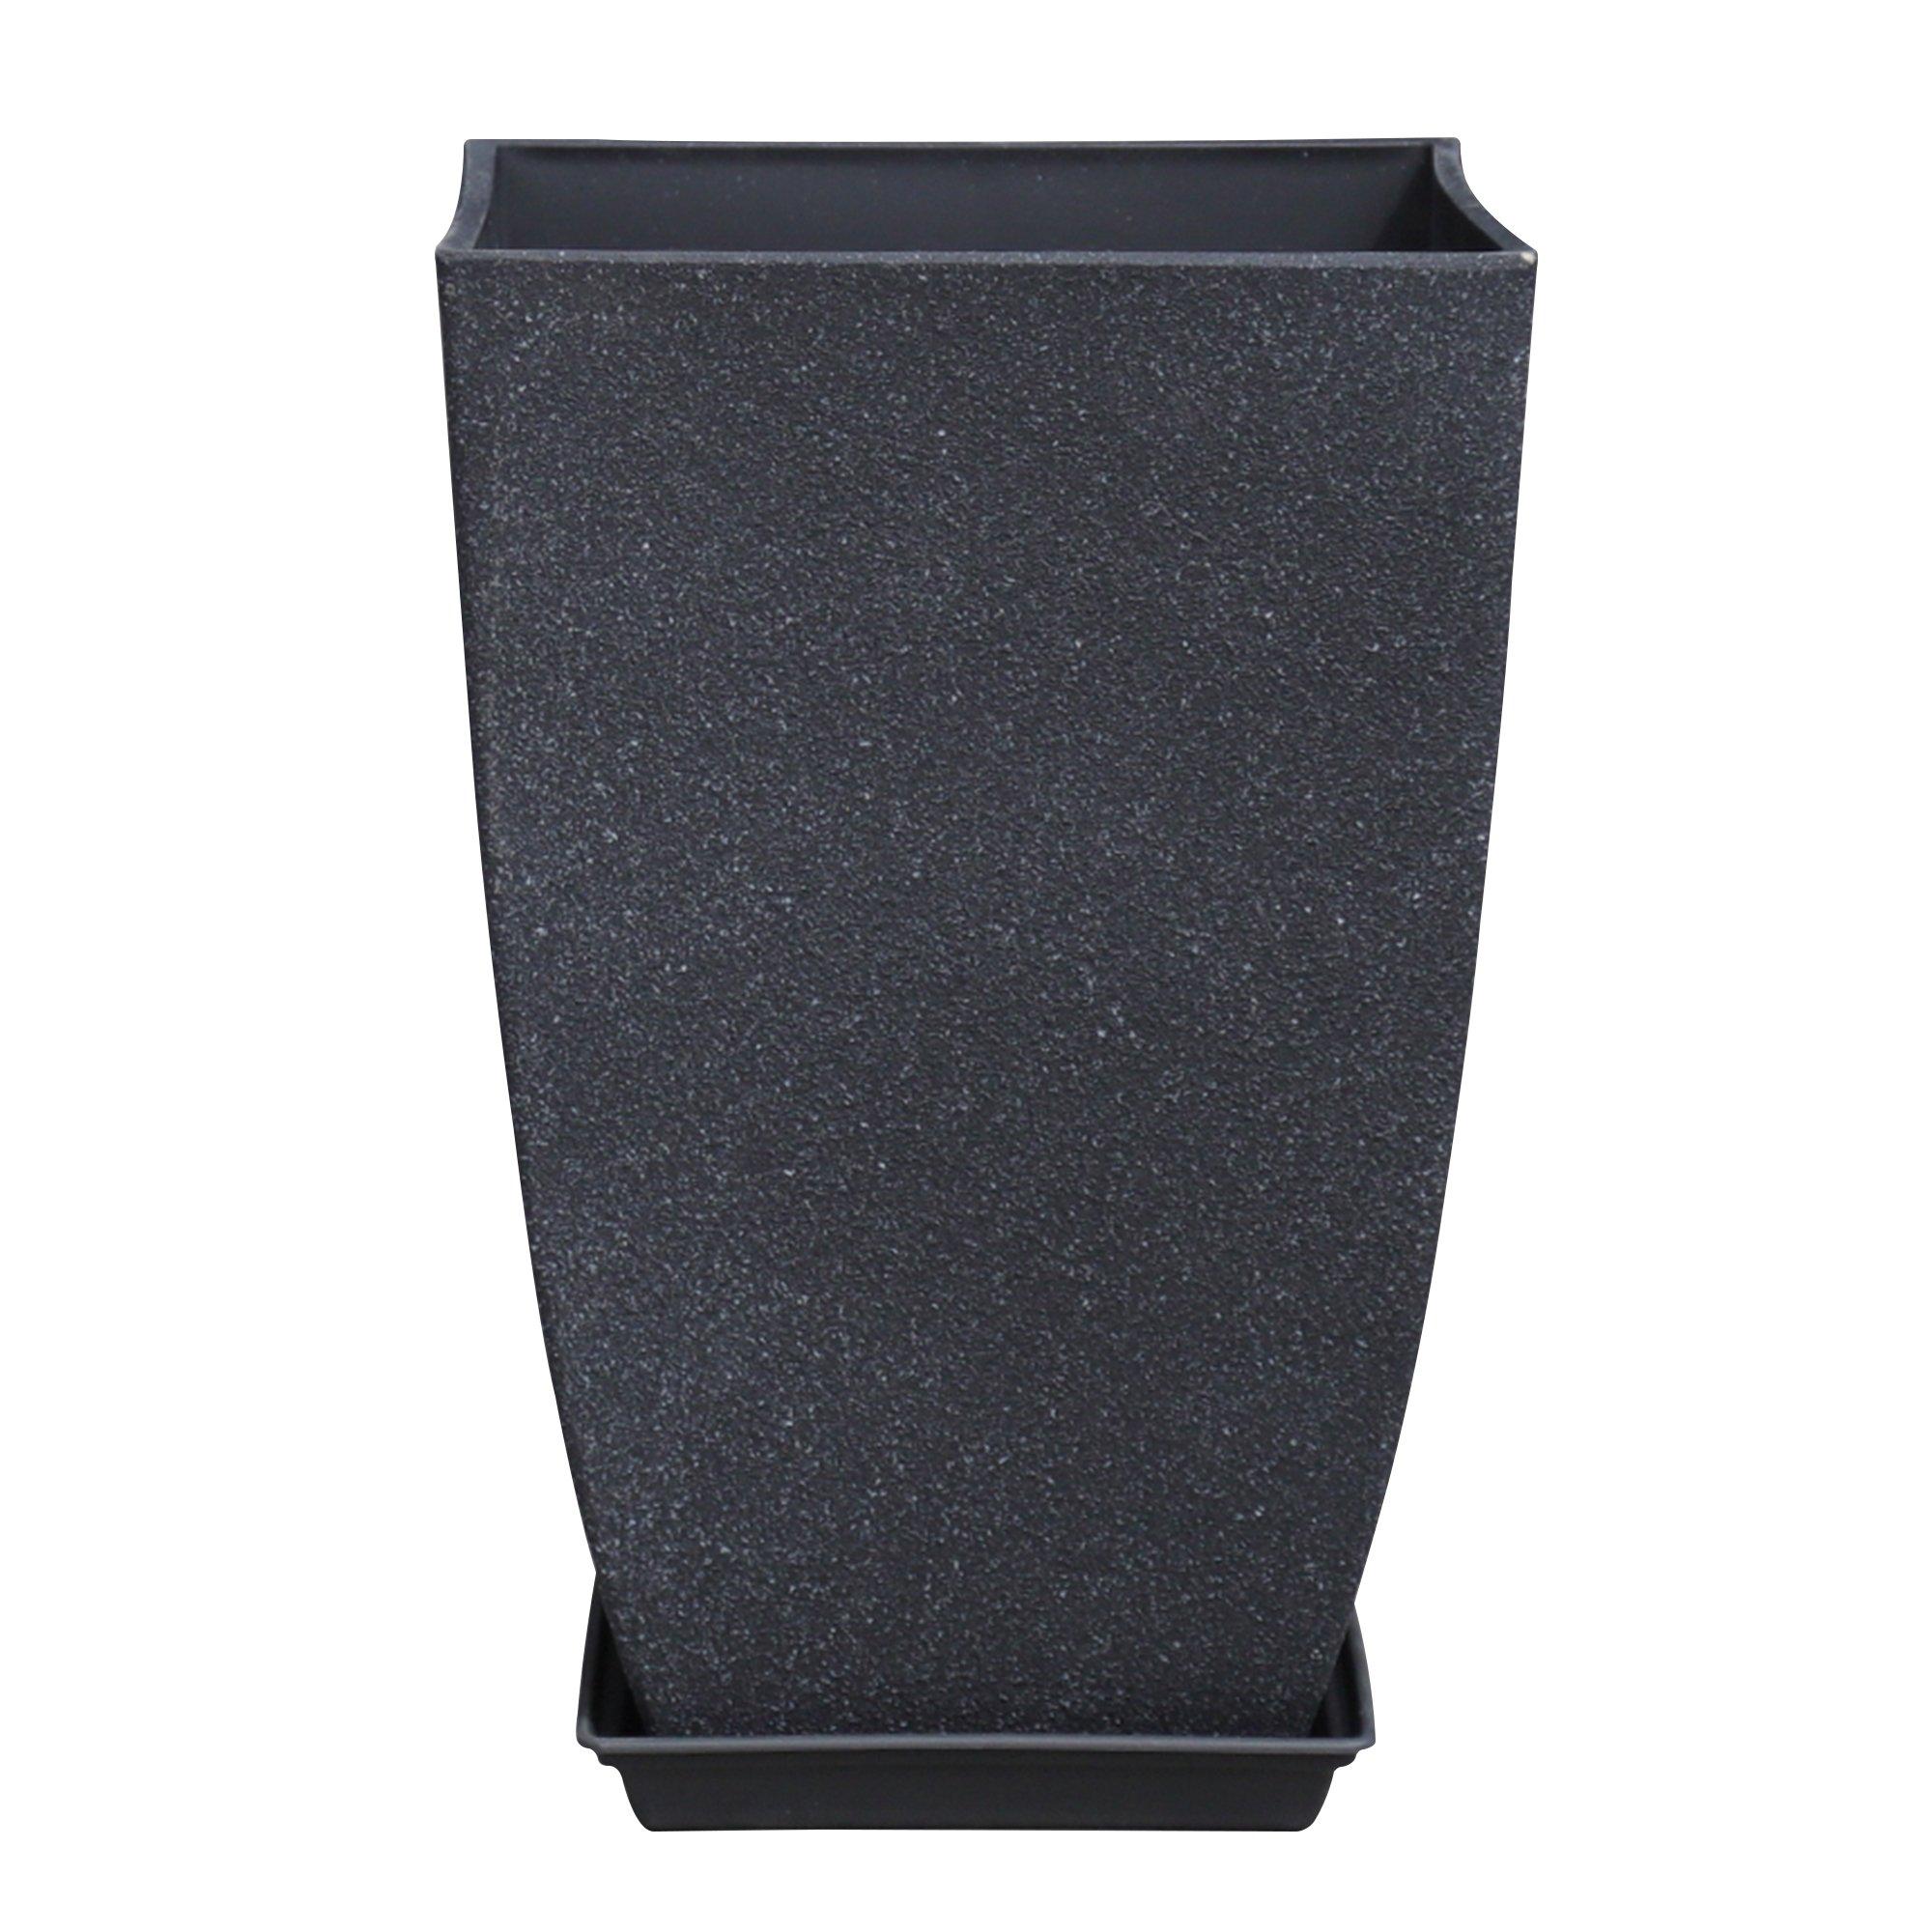 Imitation Cement Square Tall Pot Planter